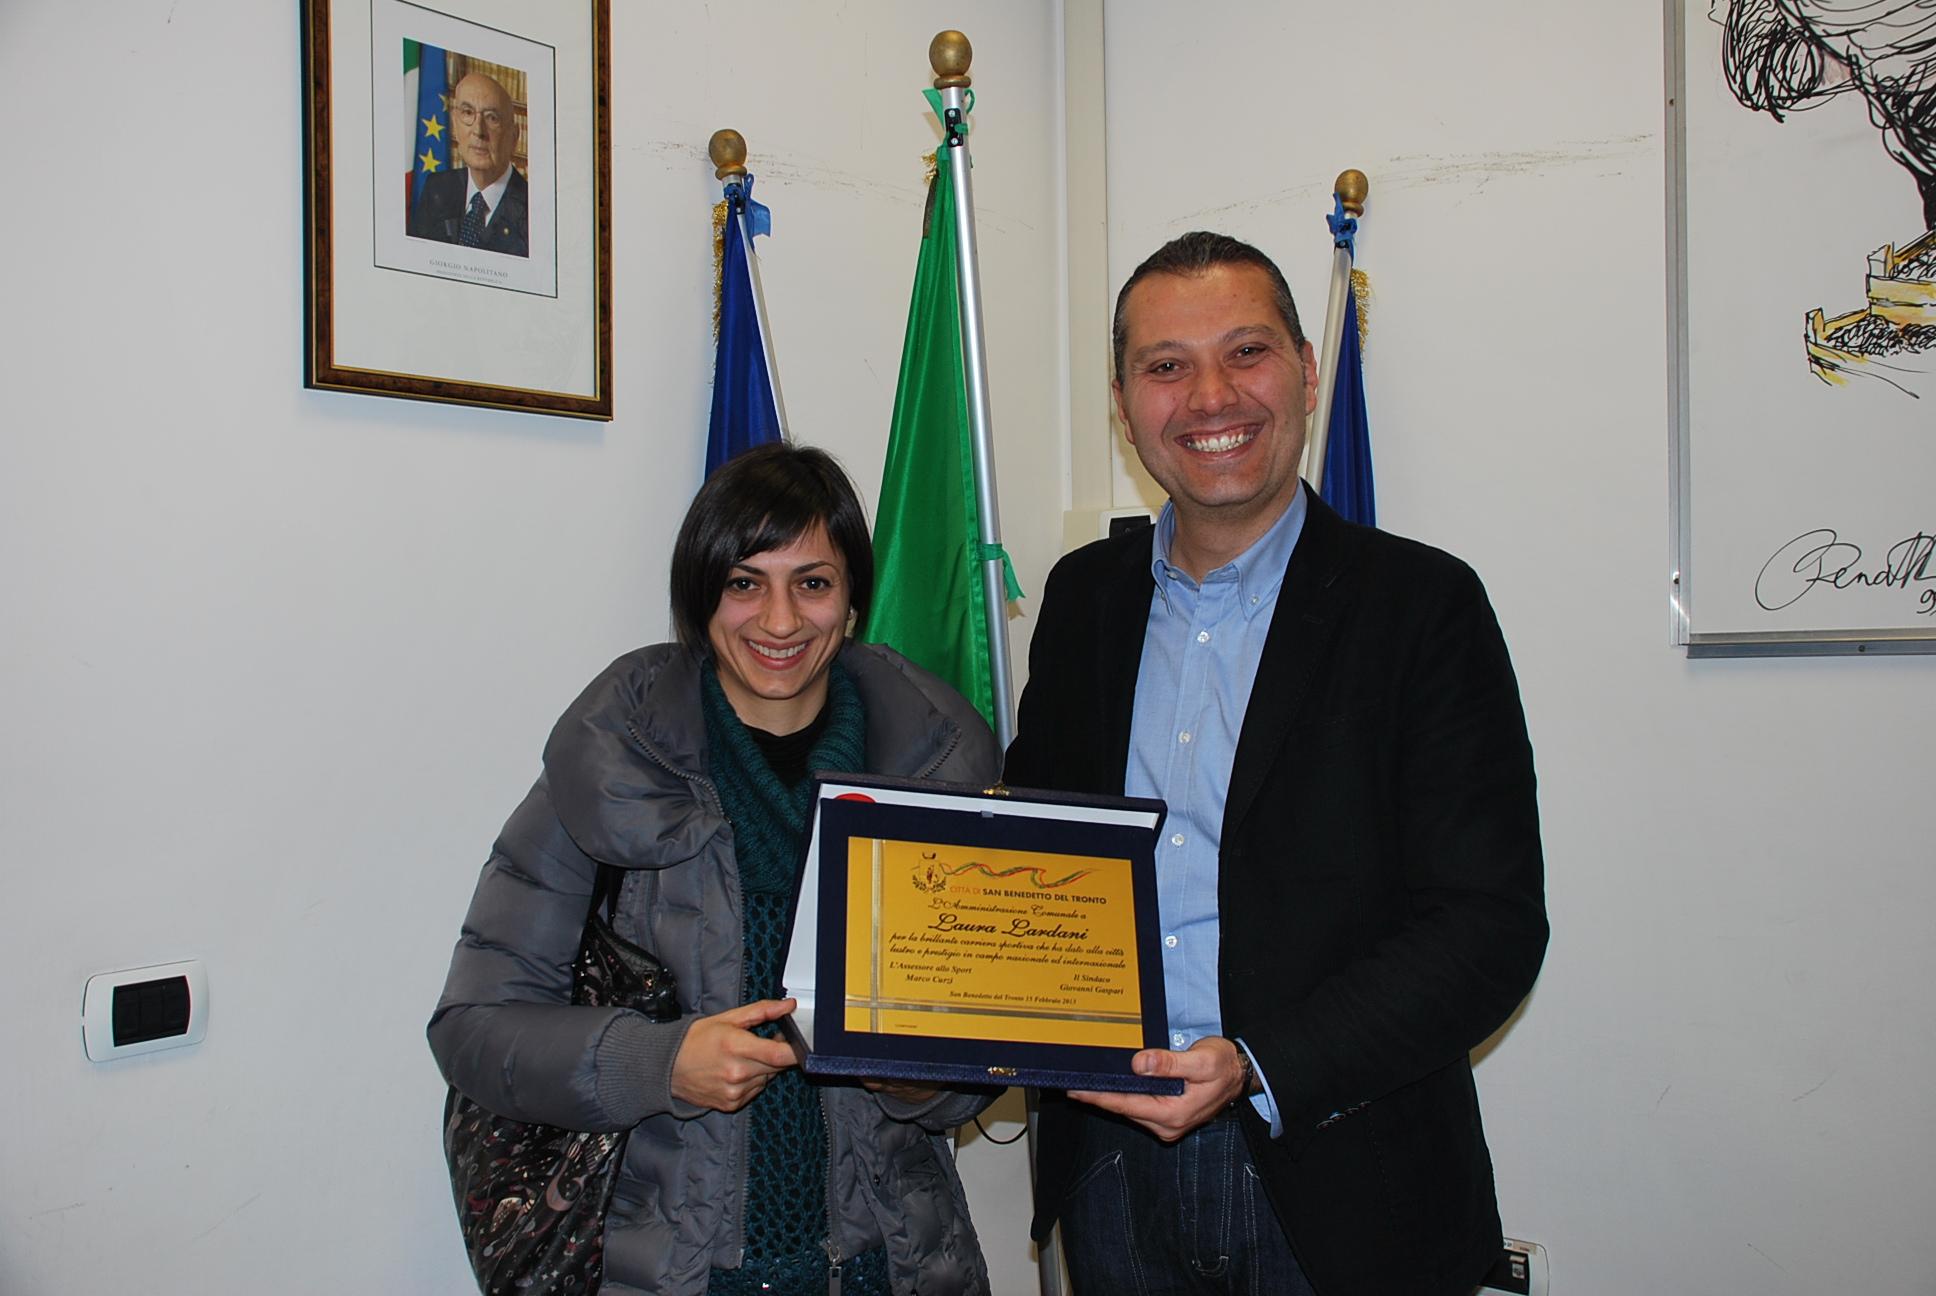 Laura Lardani con Marco Curzi